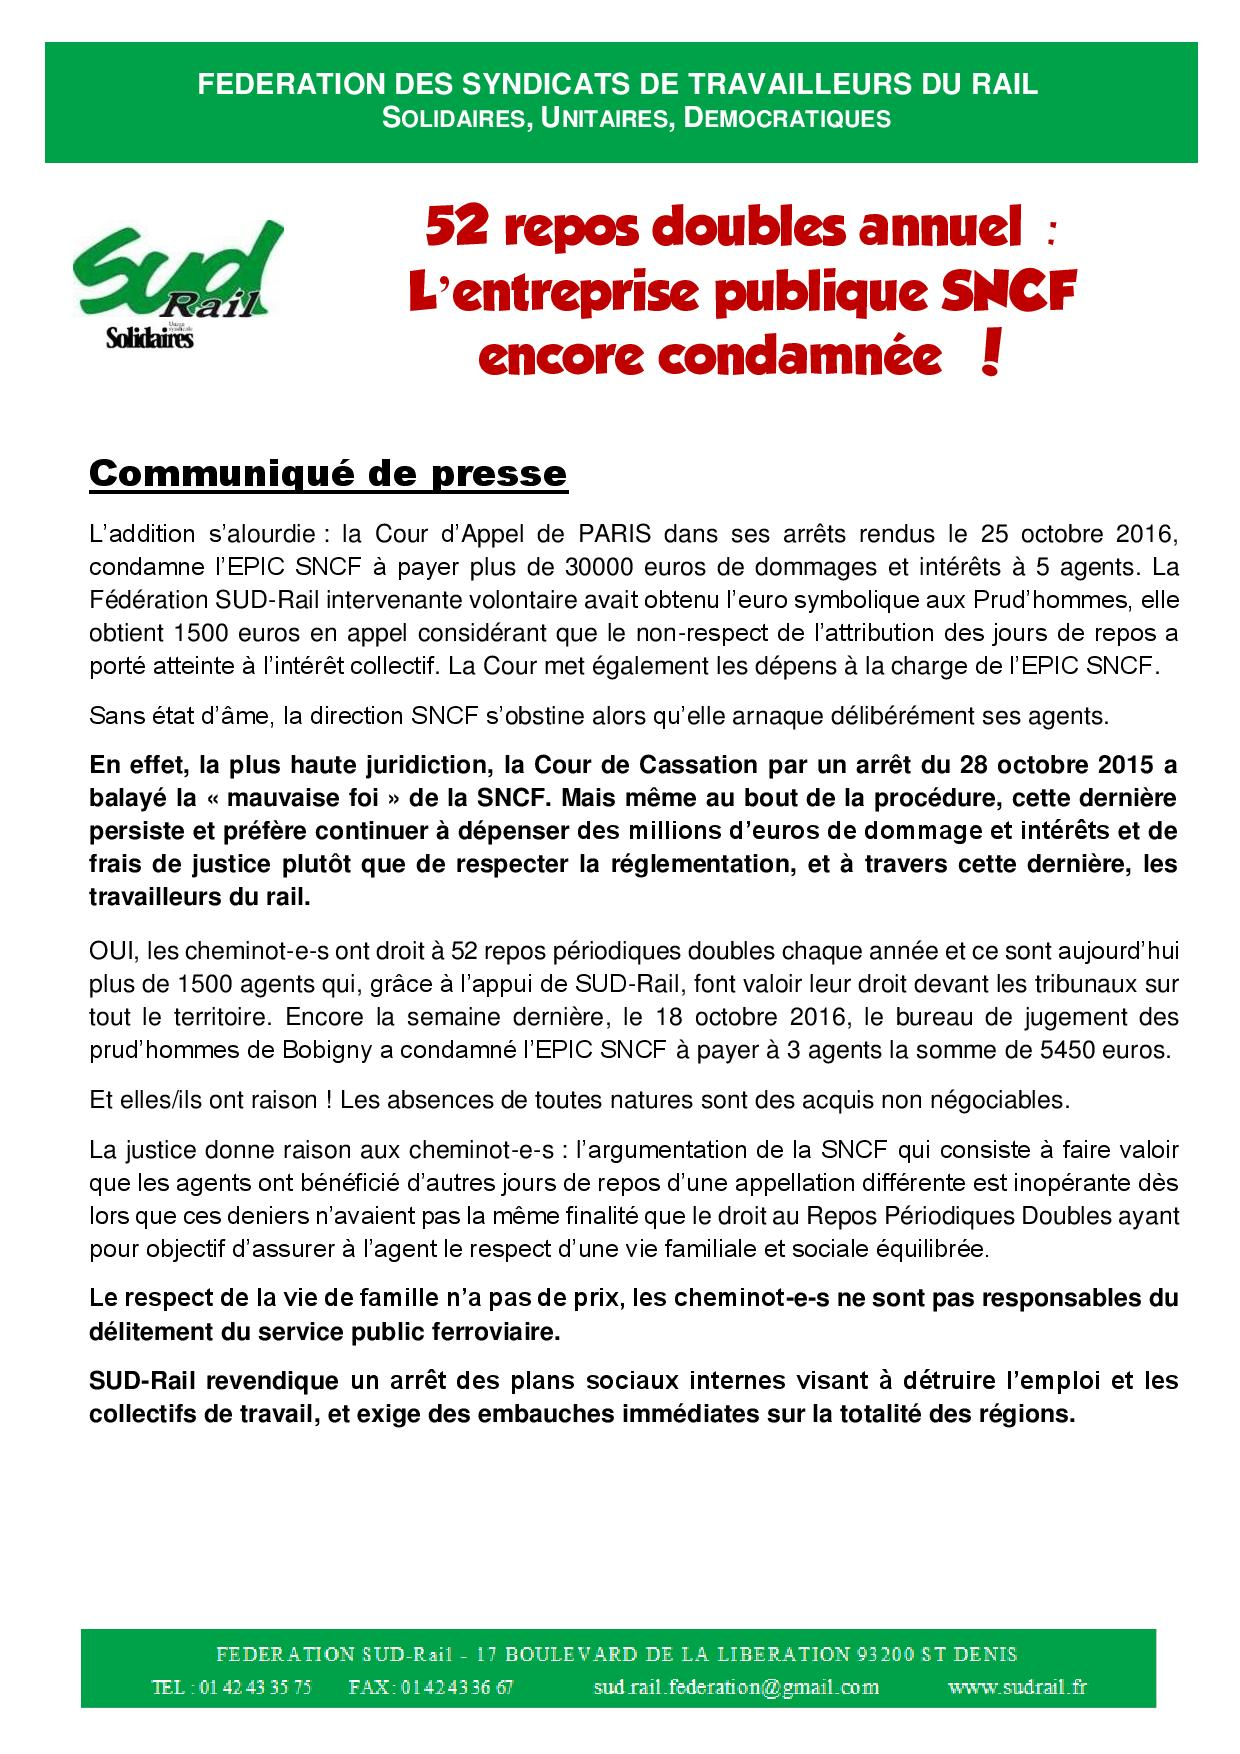 52-rp-sncf-encore-condamnee-10-2016-page-001